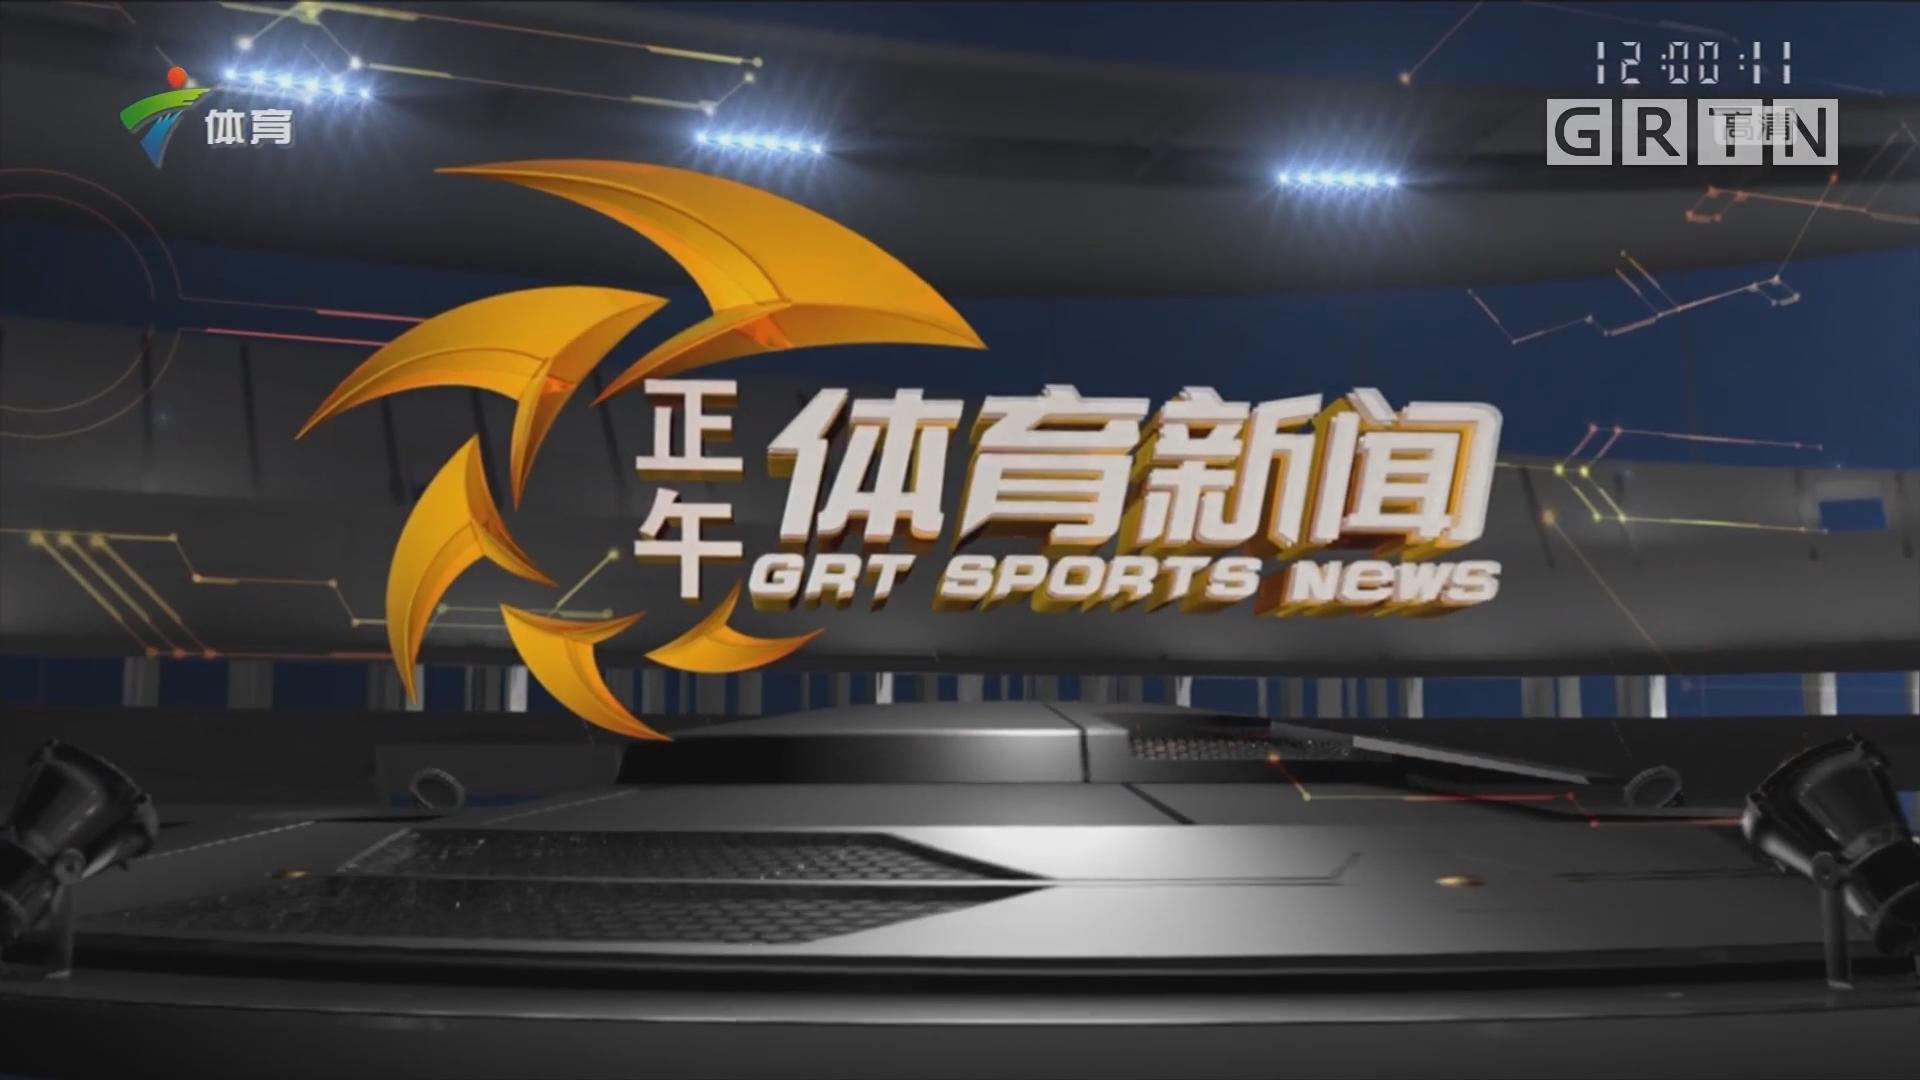 [HD][2018-09-29]正午体育新闻:卡纳瓦罗:每一场都是决赛 对大连也一样